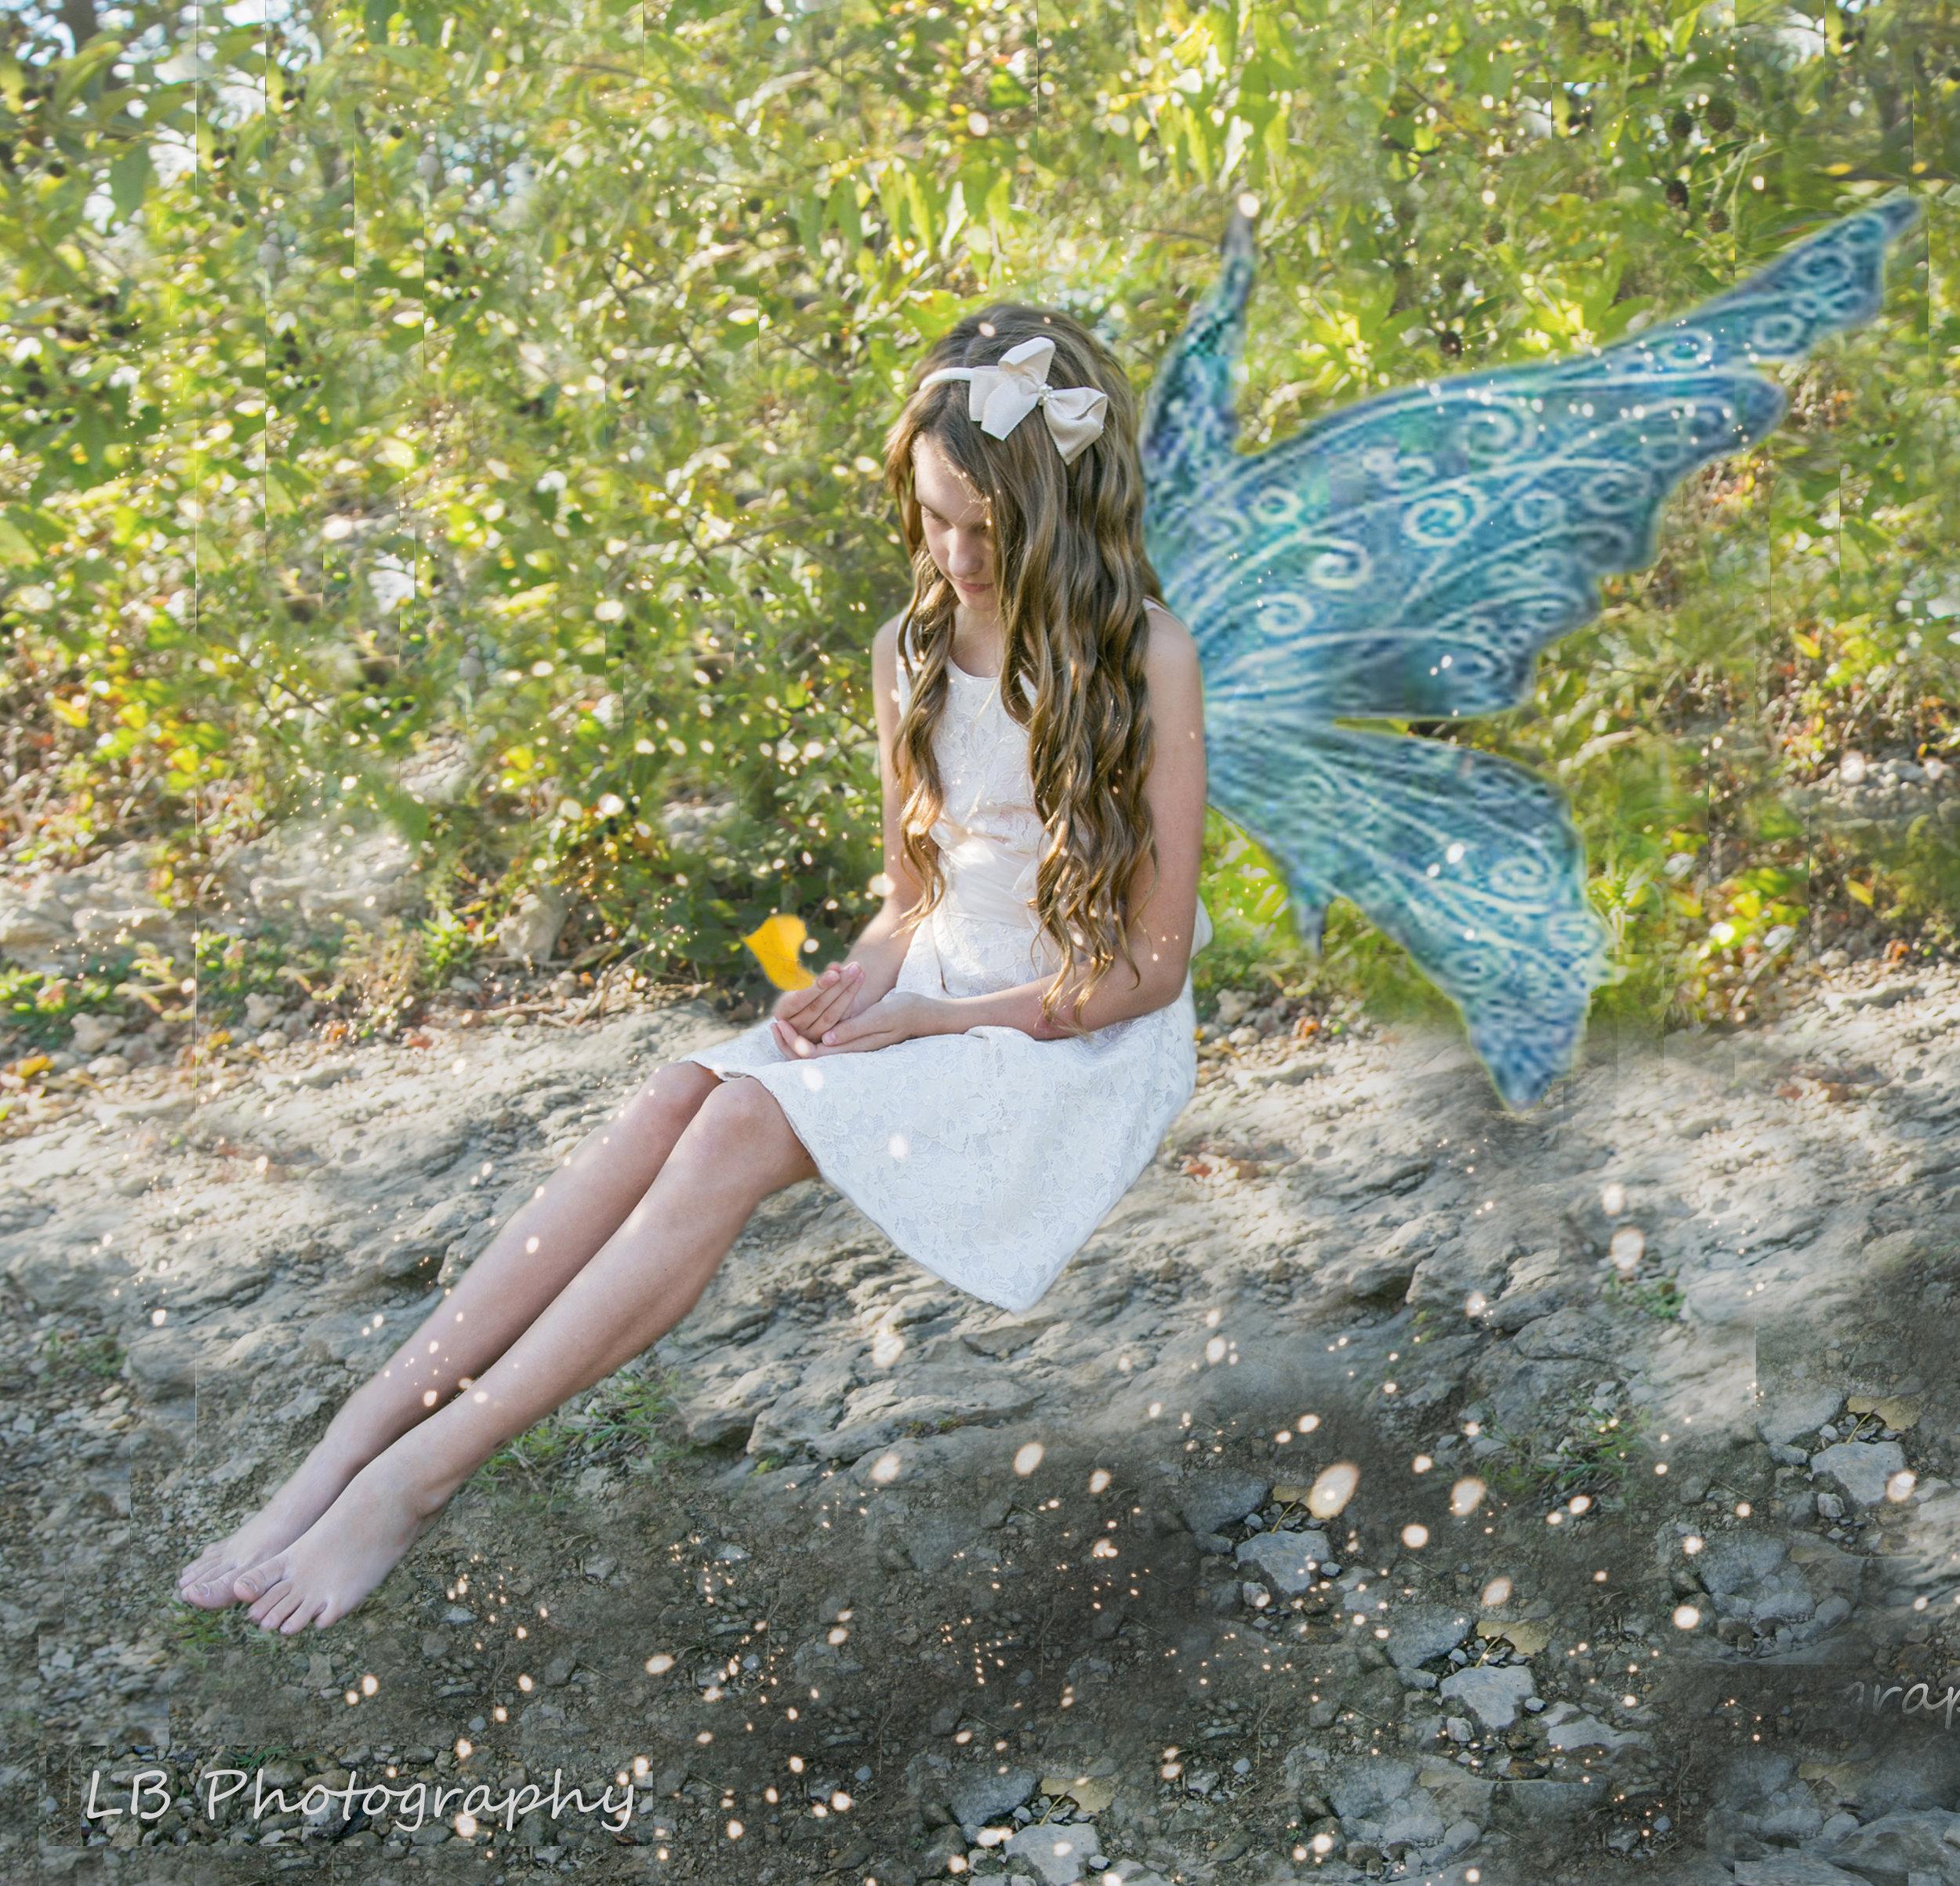 blue wings angel Aspyn.jpg